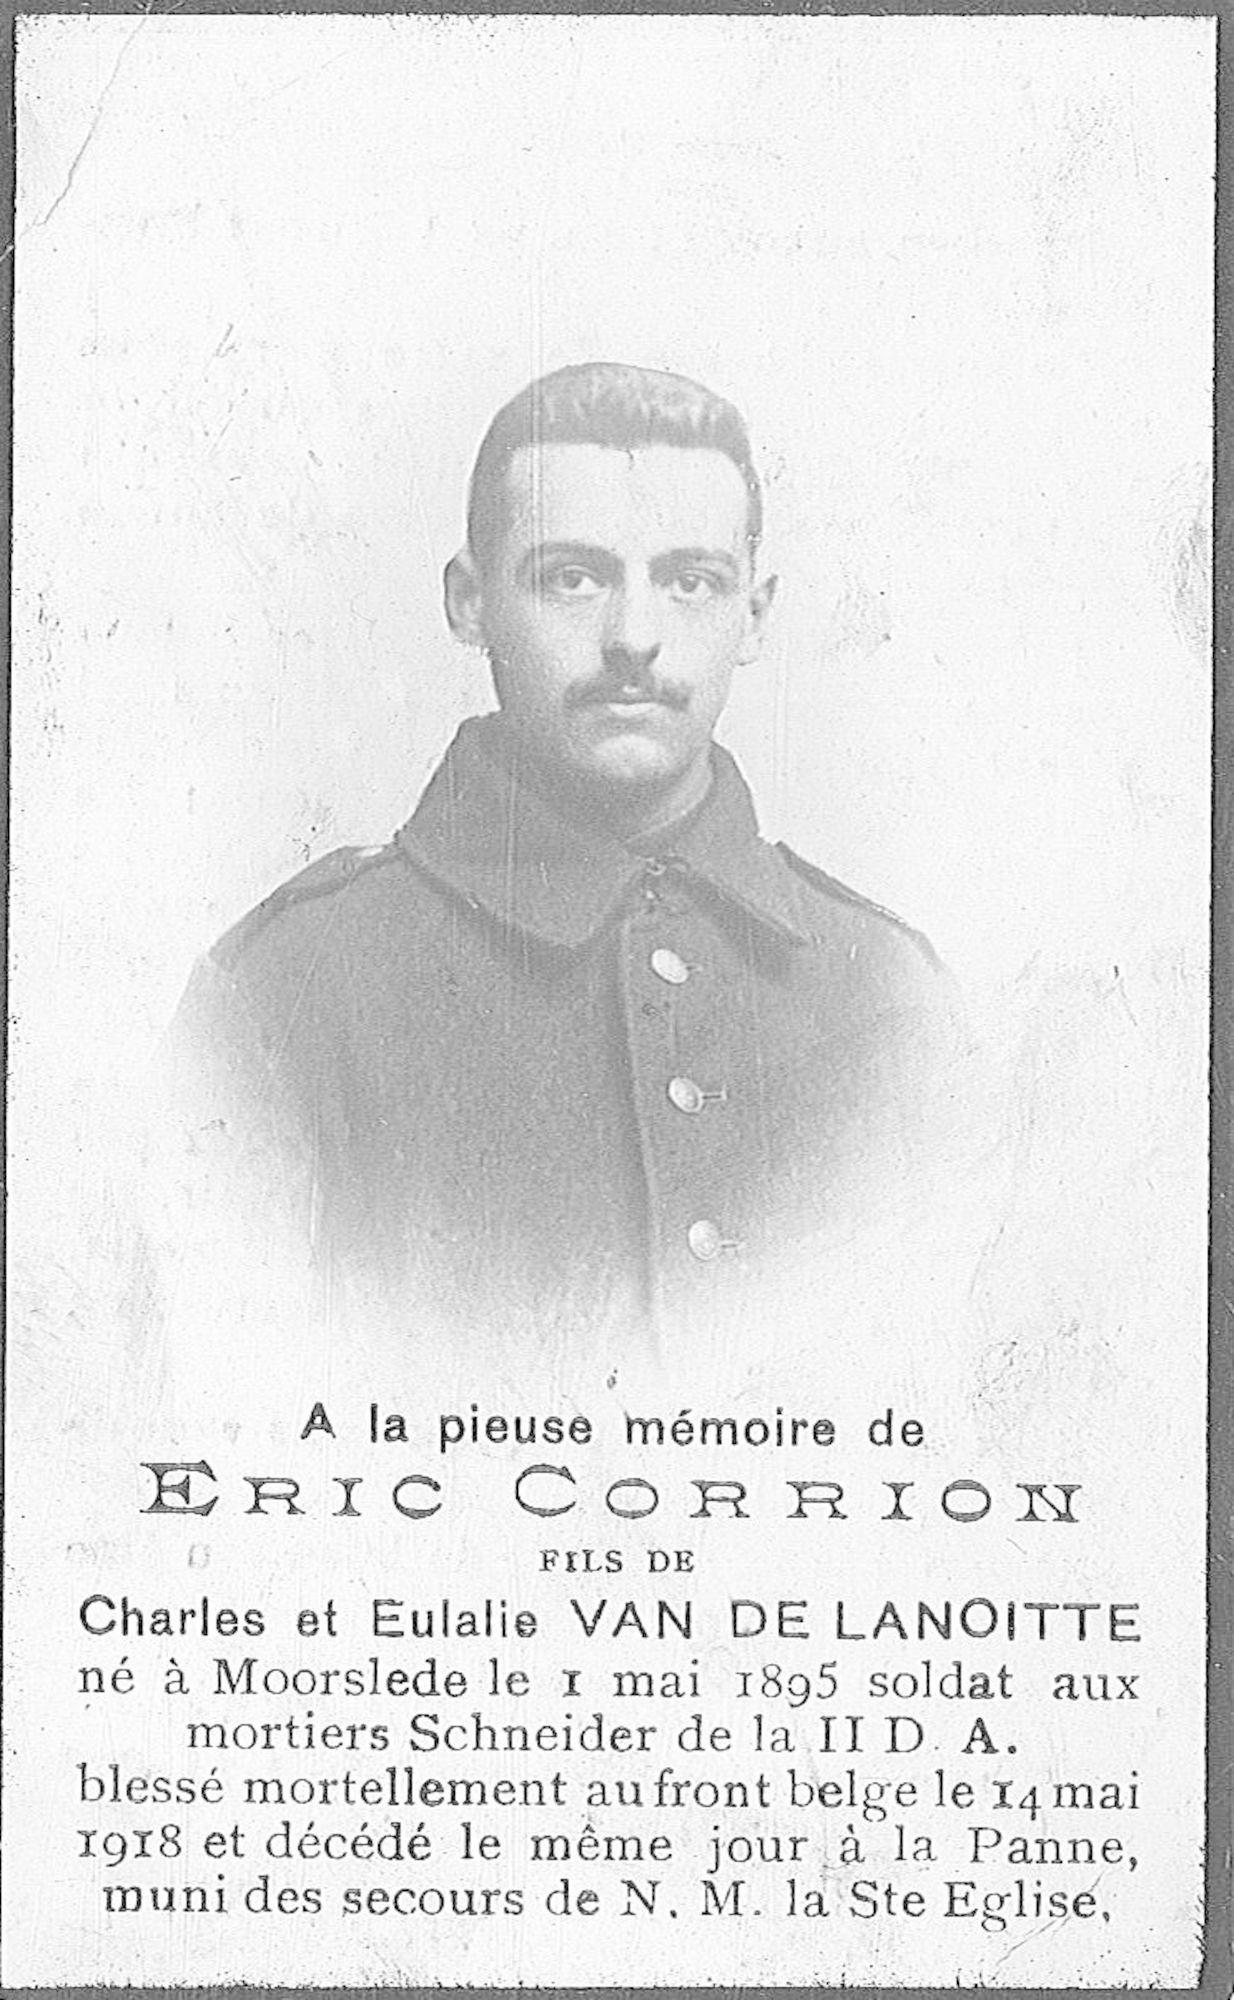 Corrion Eric